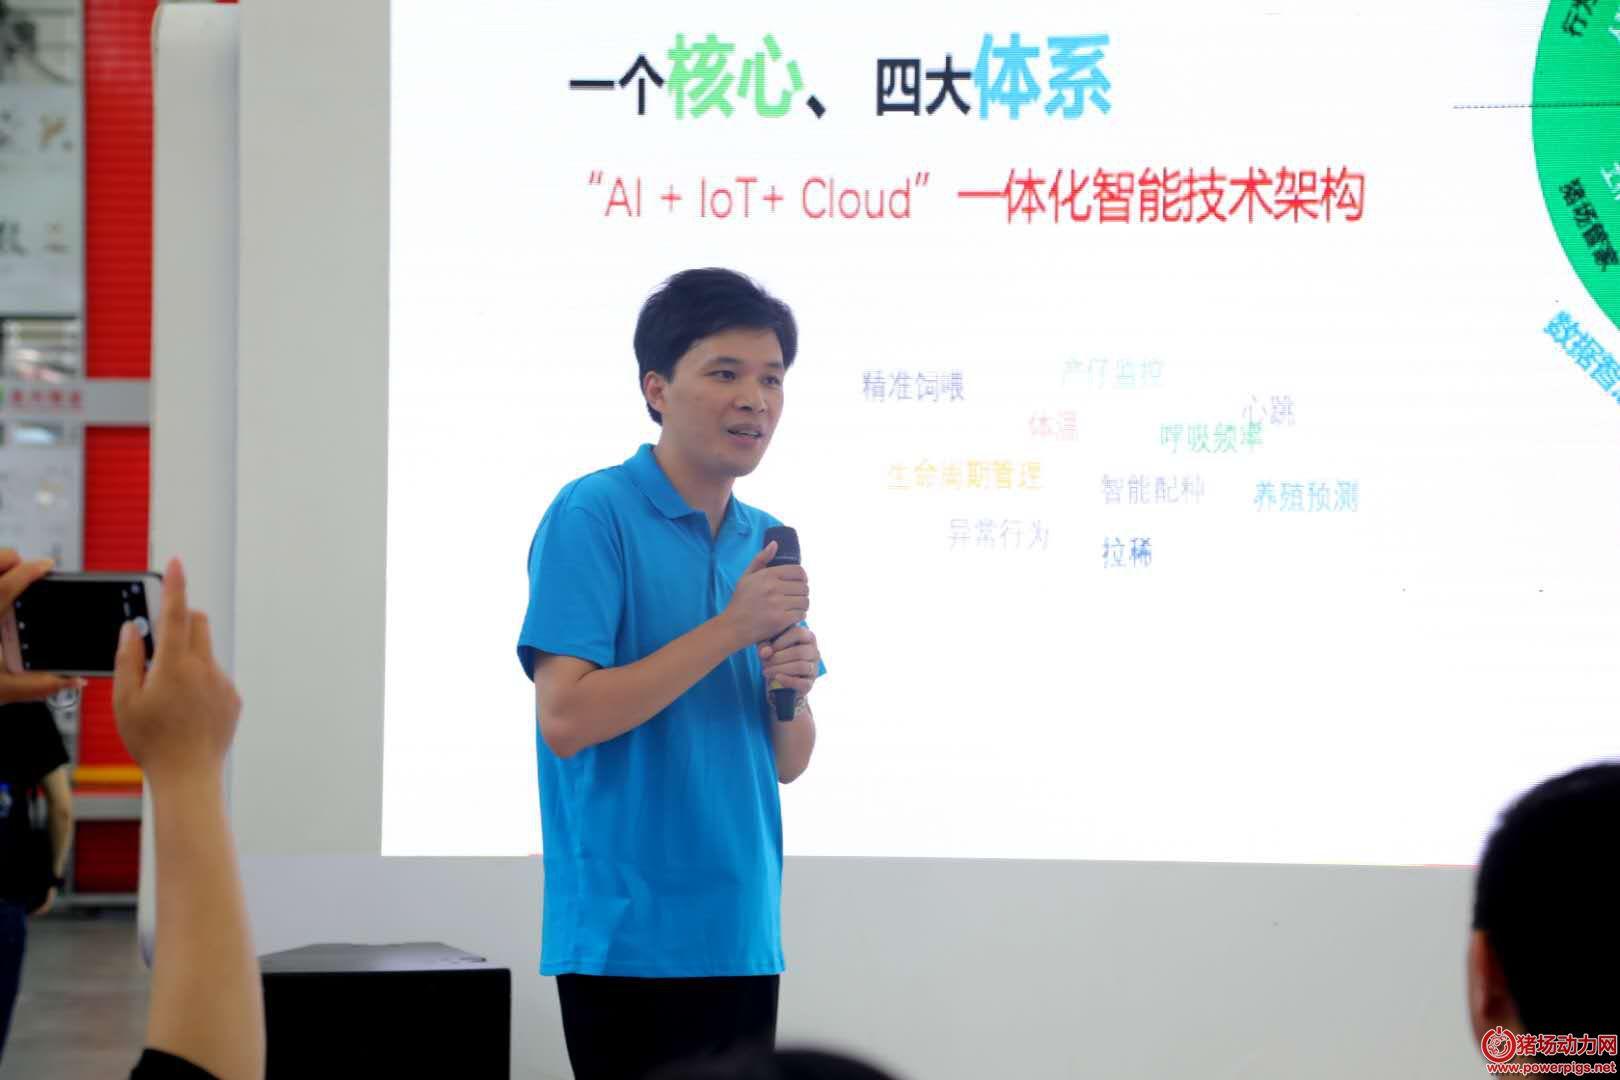 http://www.reviewcode.cn/rengongzhinen/48849.html